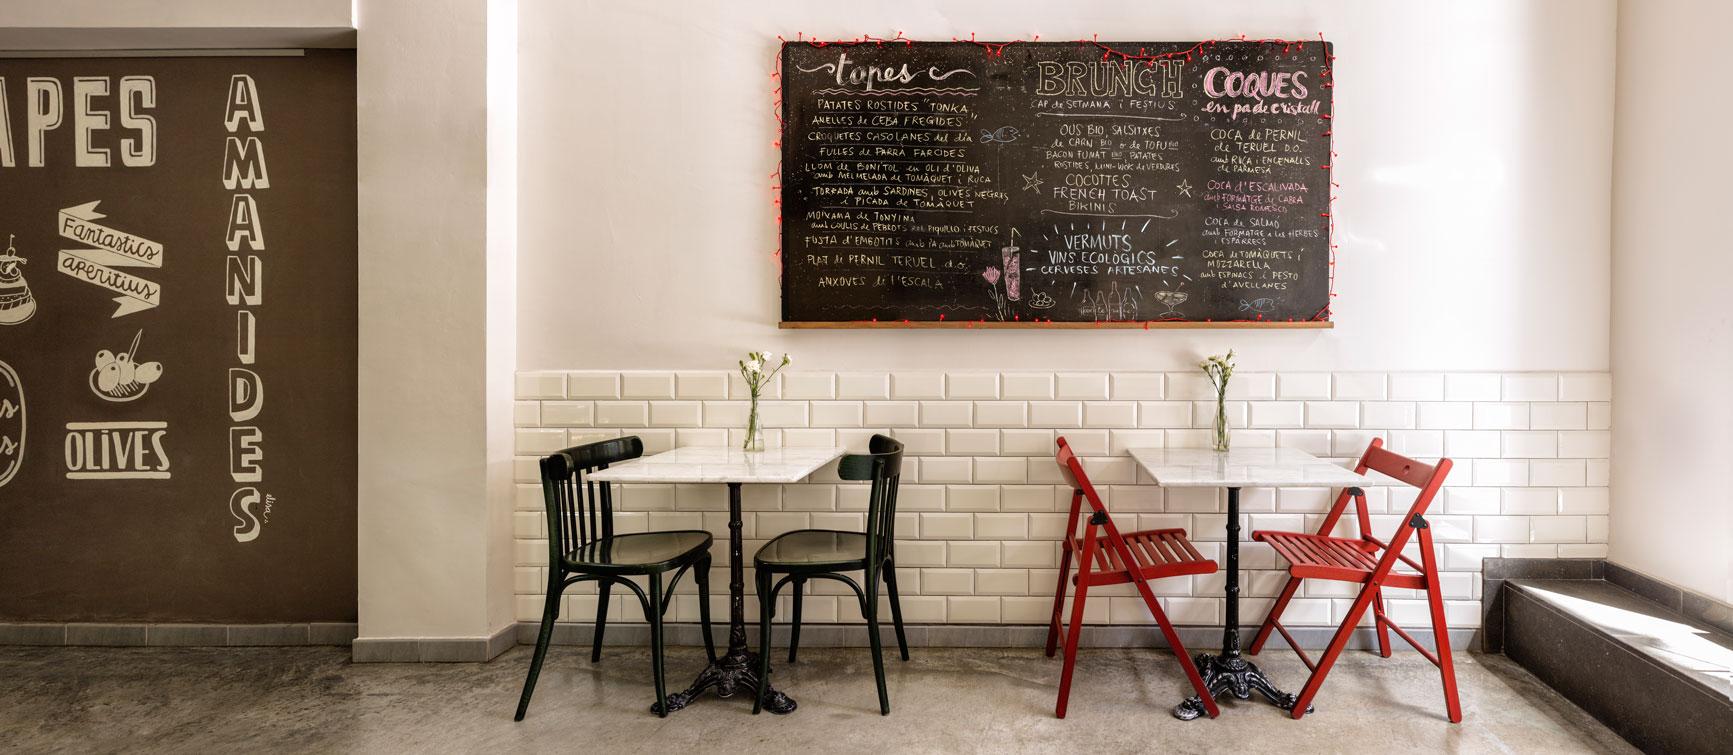 foto panoramica restaurante